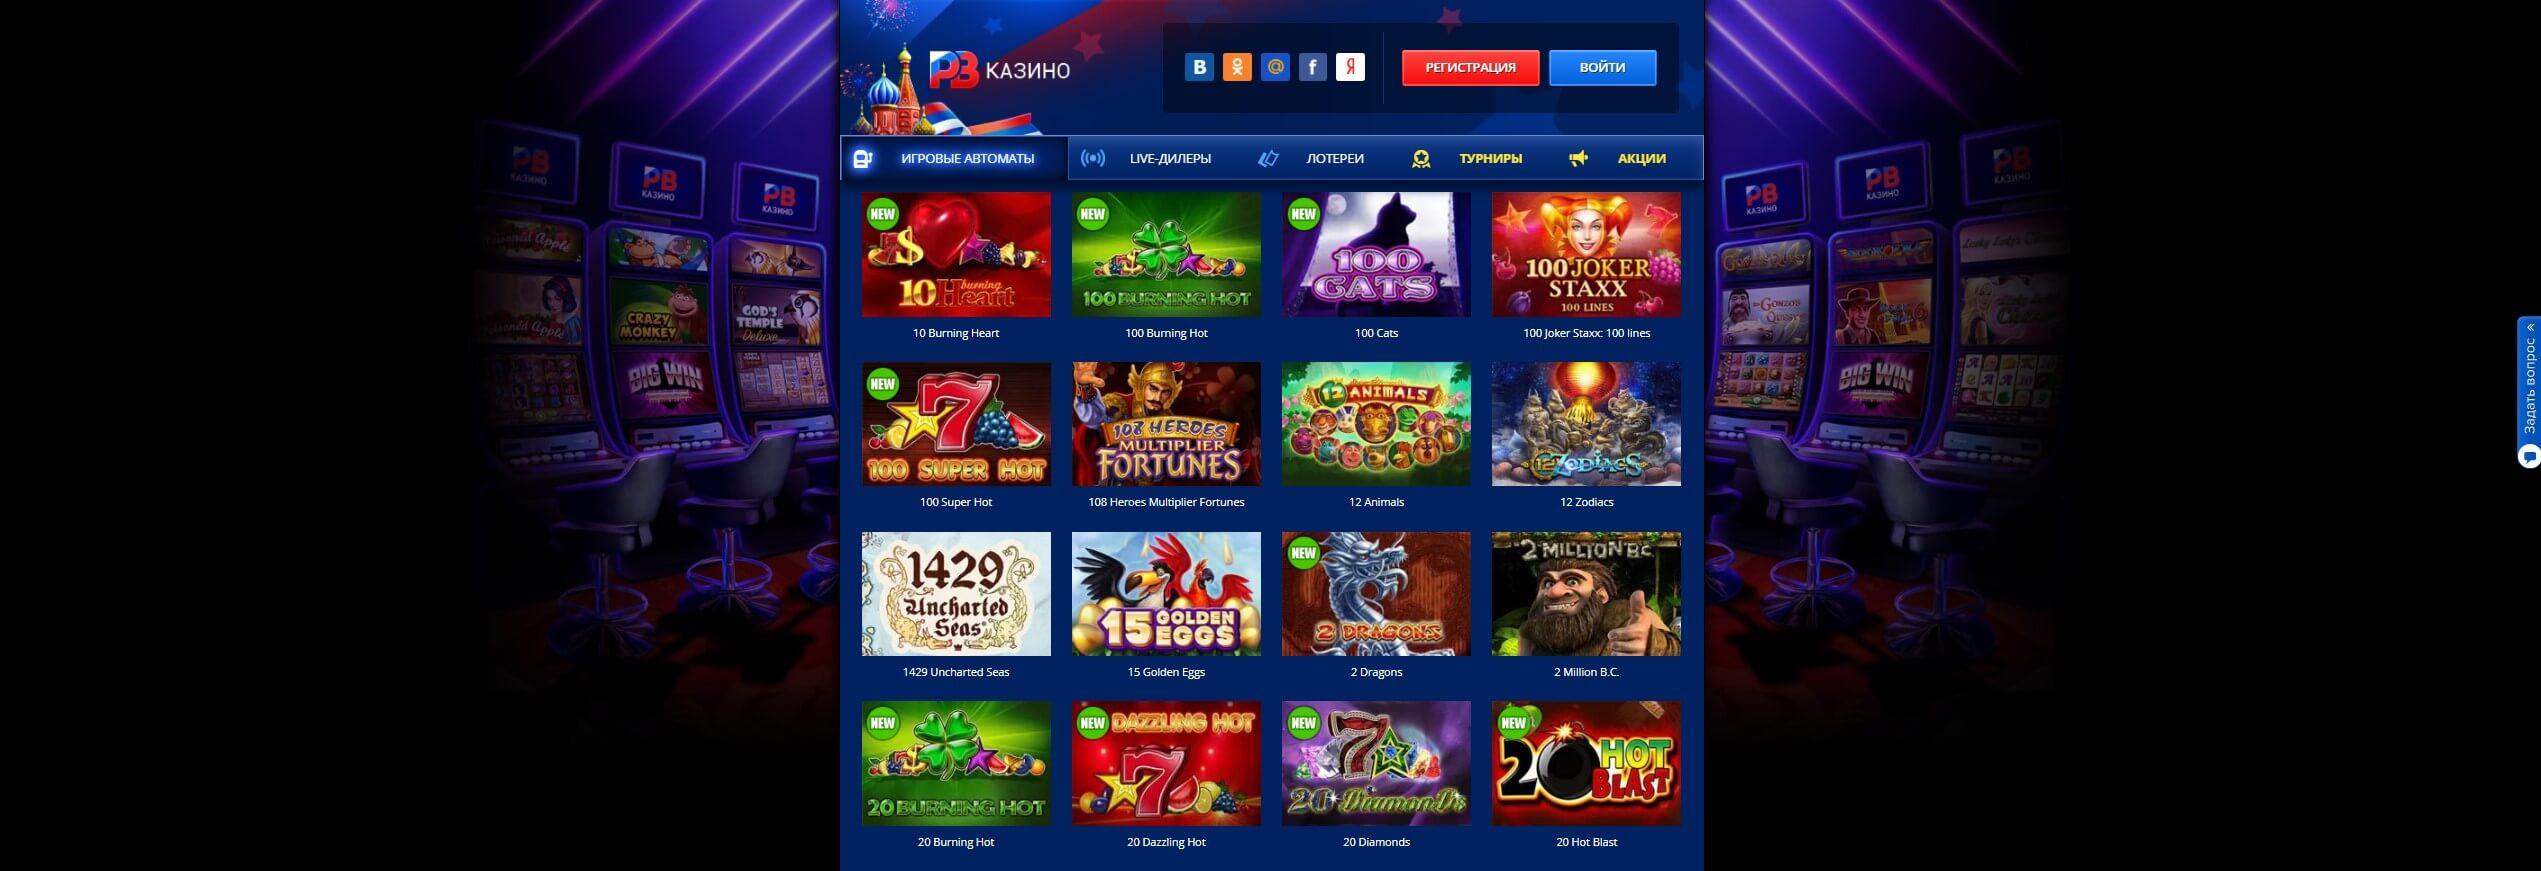 rv casino игровые автоматы